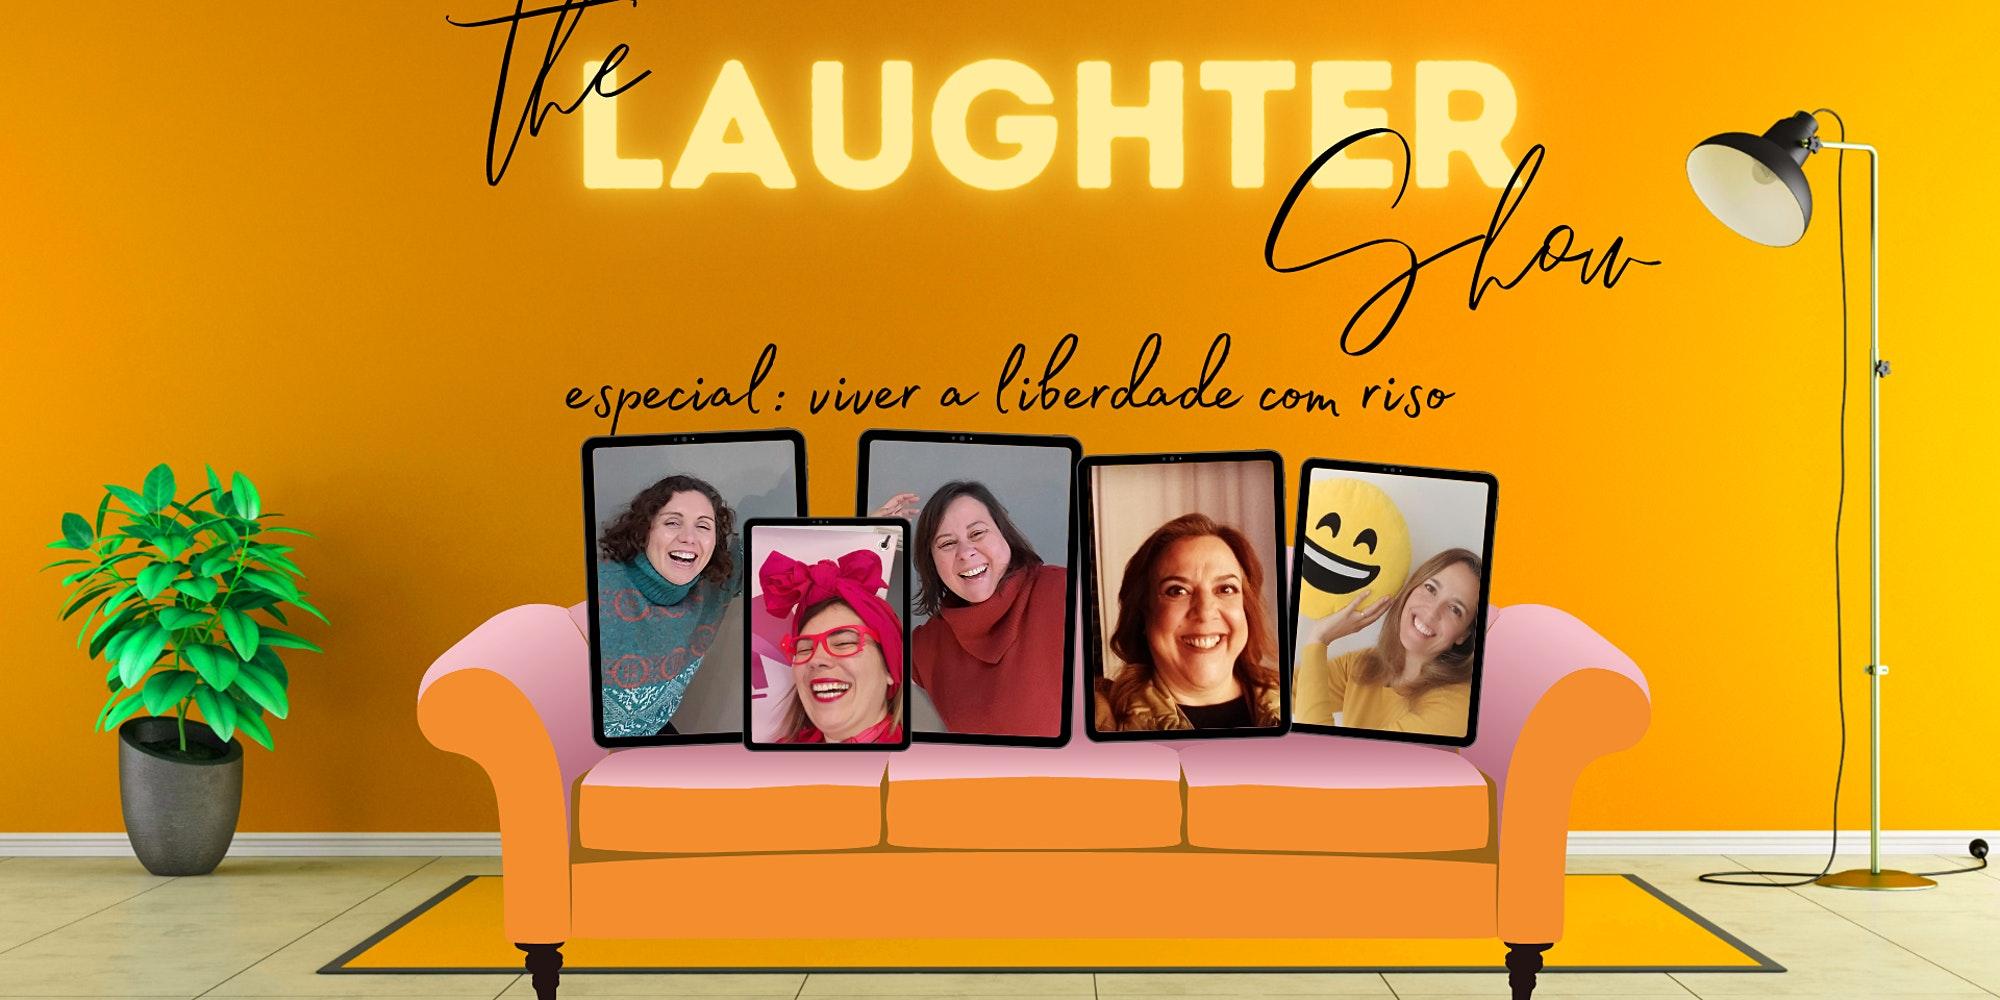 The Laughter Show: especial liberdade